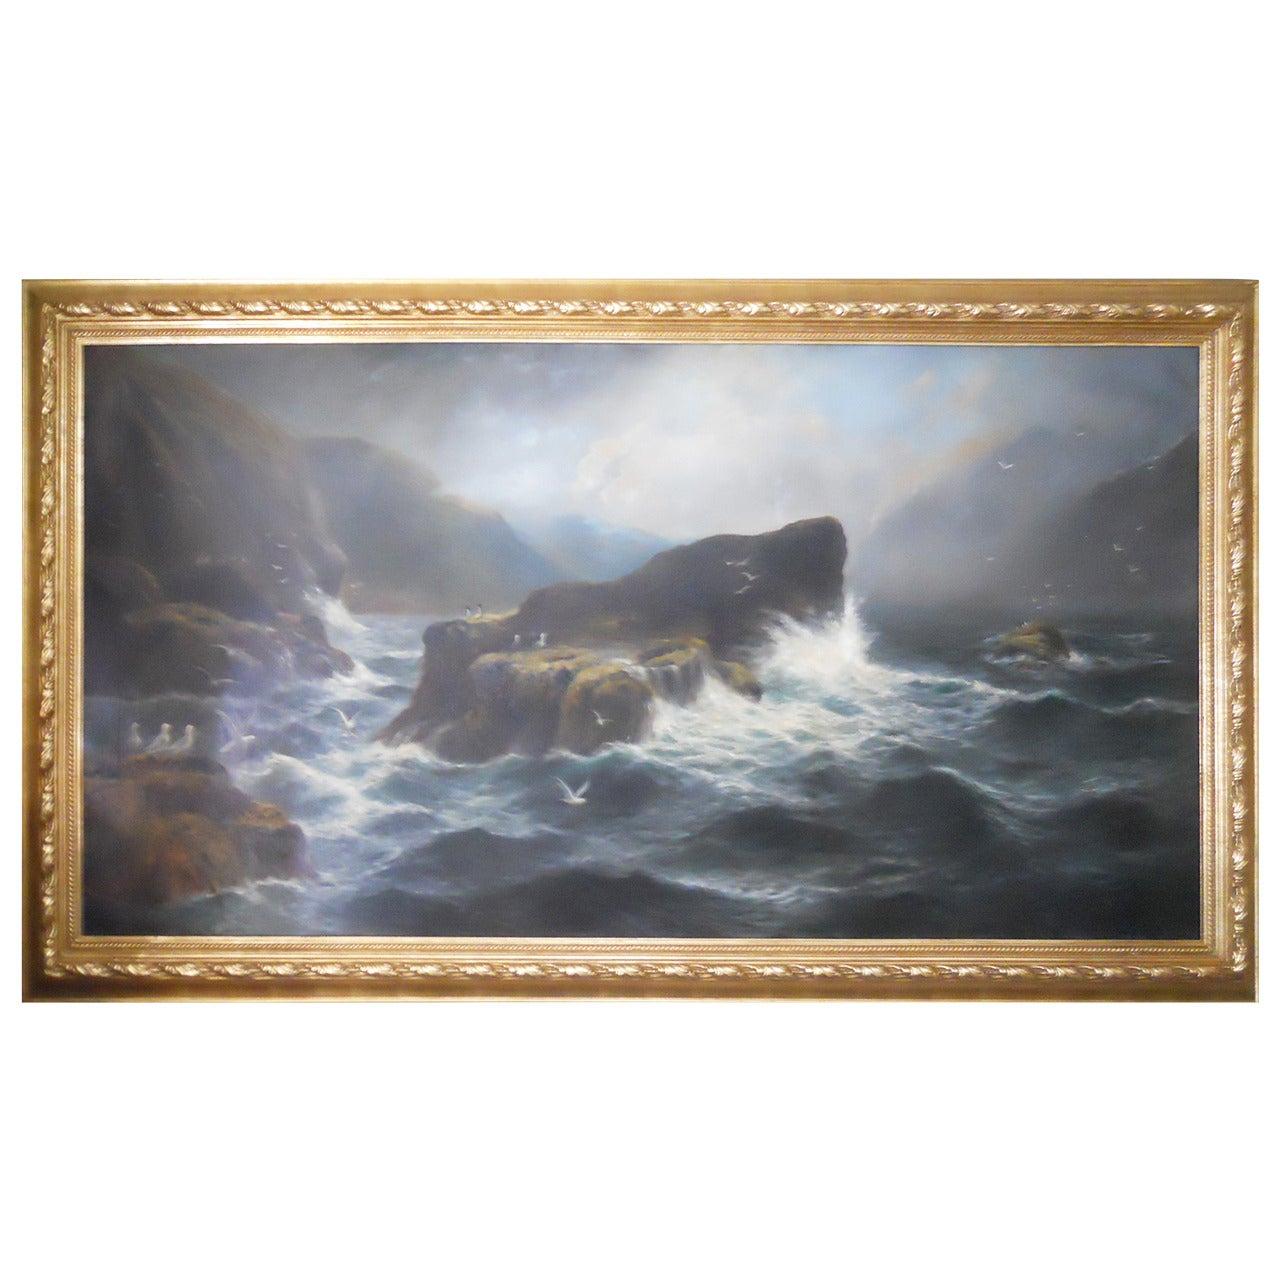 Astonishing Daniel Sherrin 19th Century Oil Painting of a Seascape